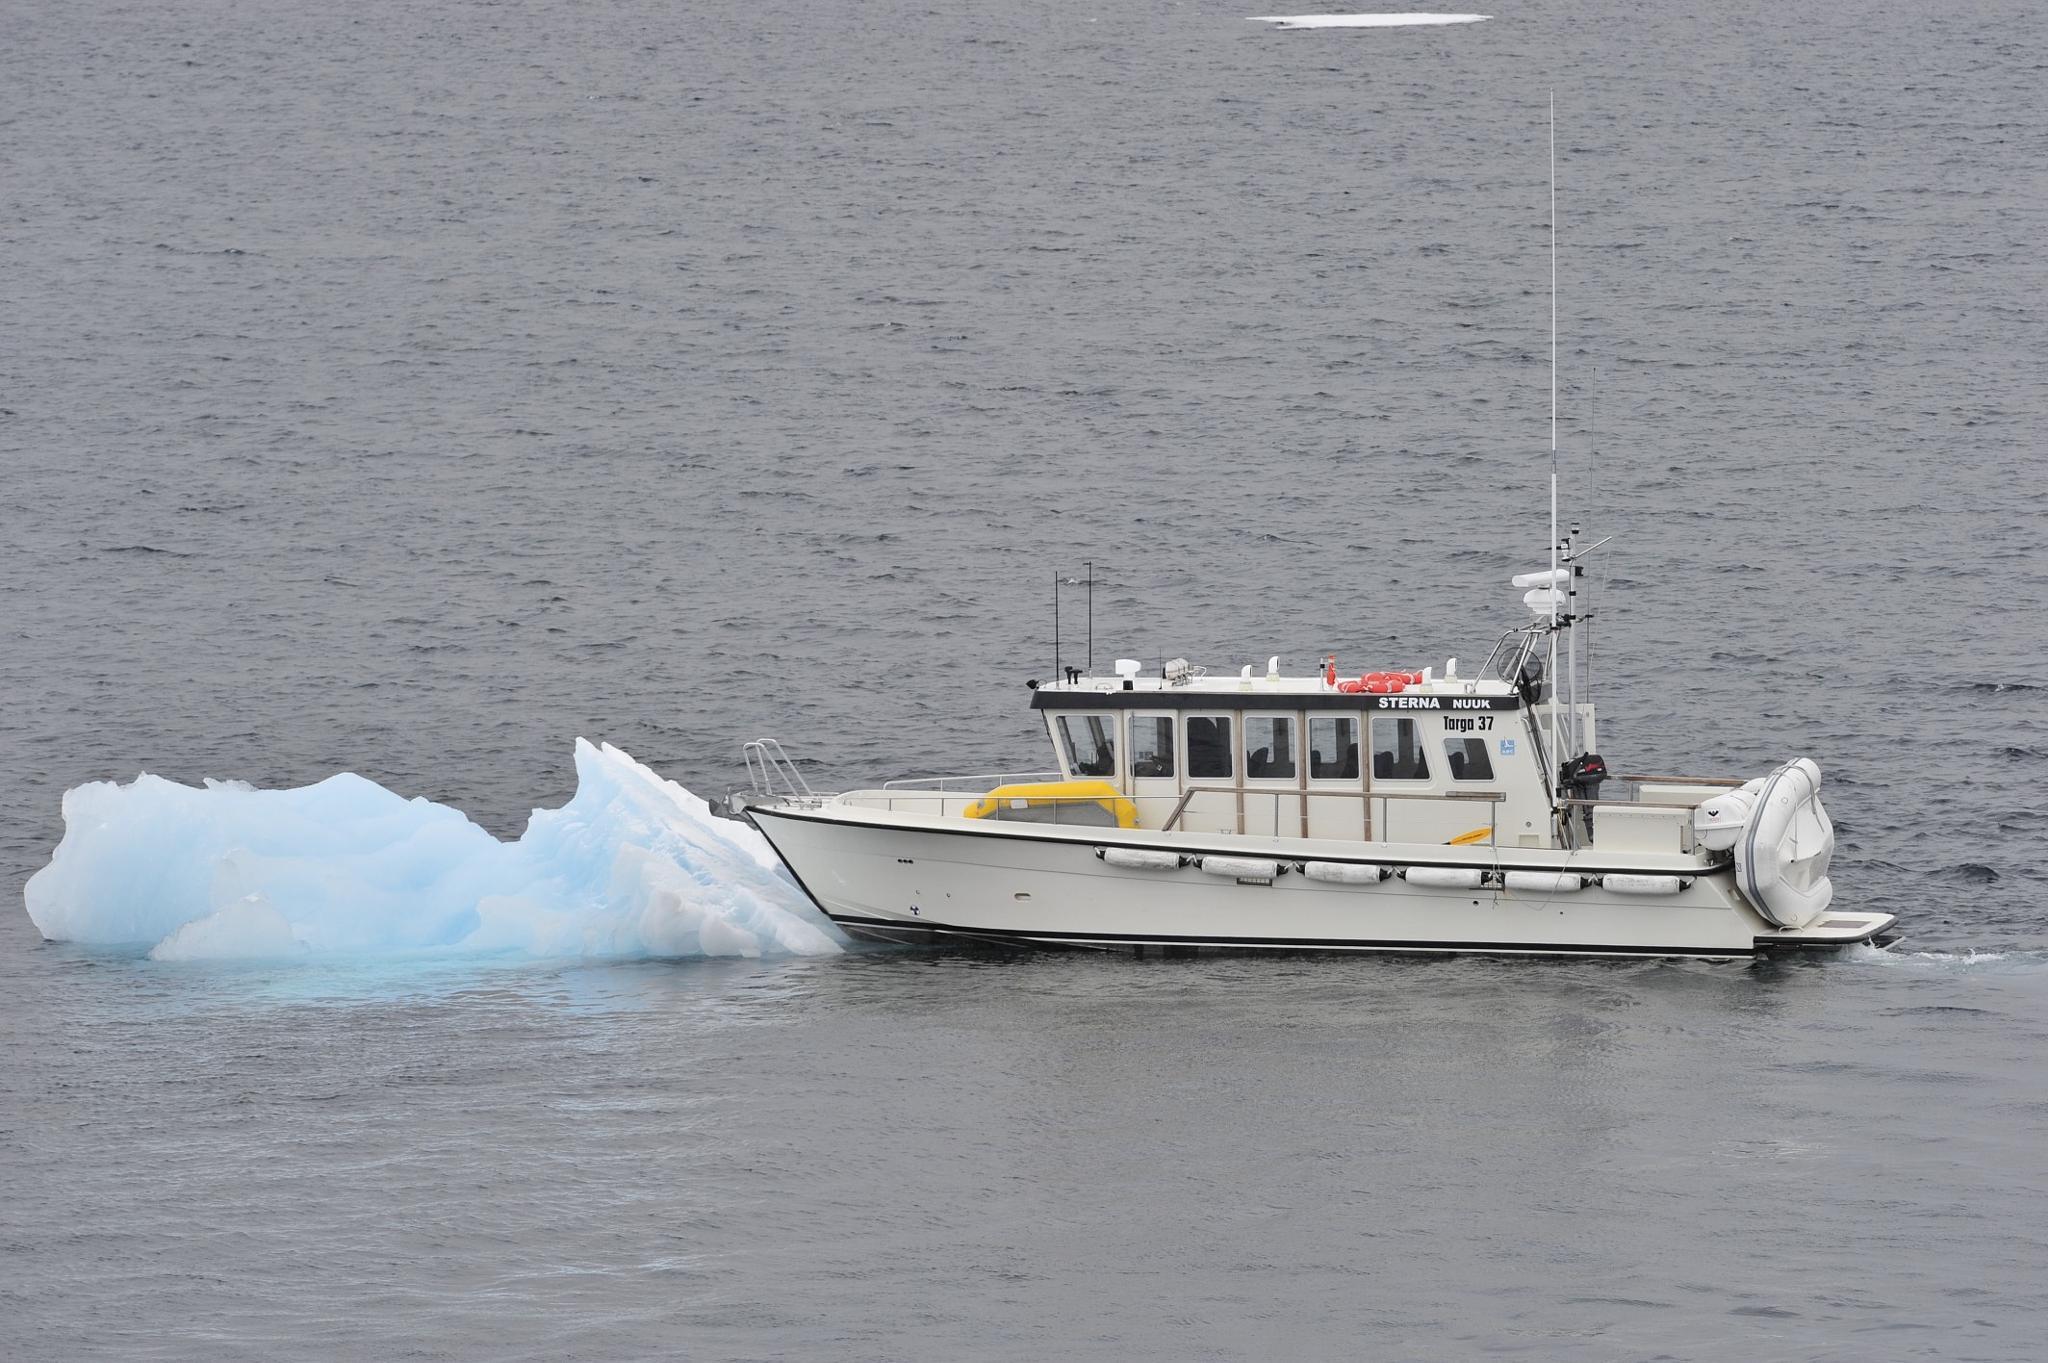 charterboat Nuuk by Tom Augo Lynge